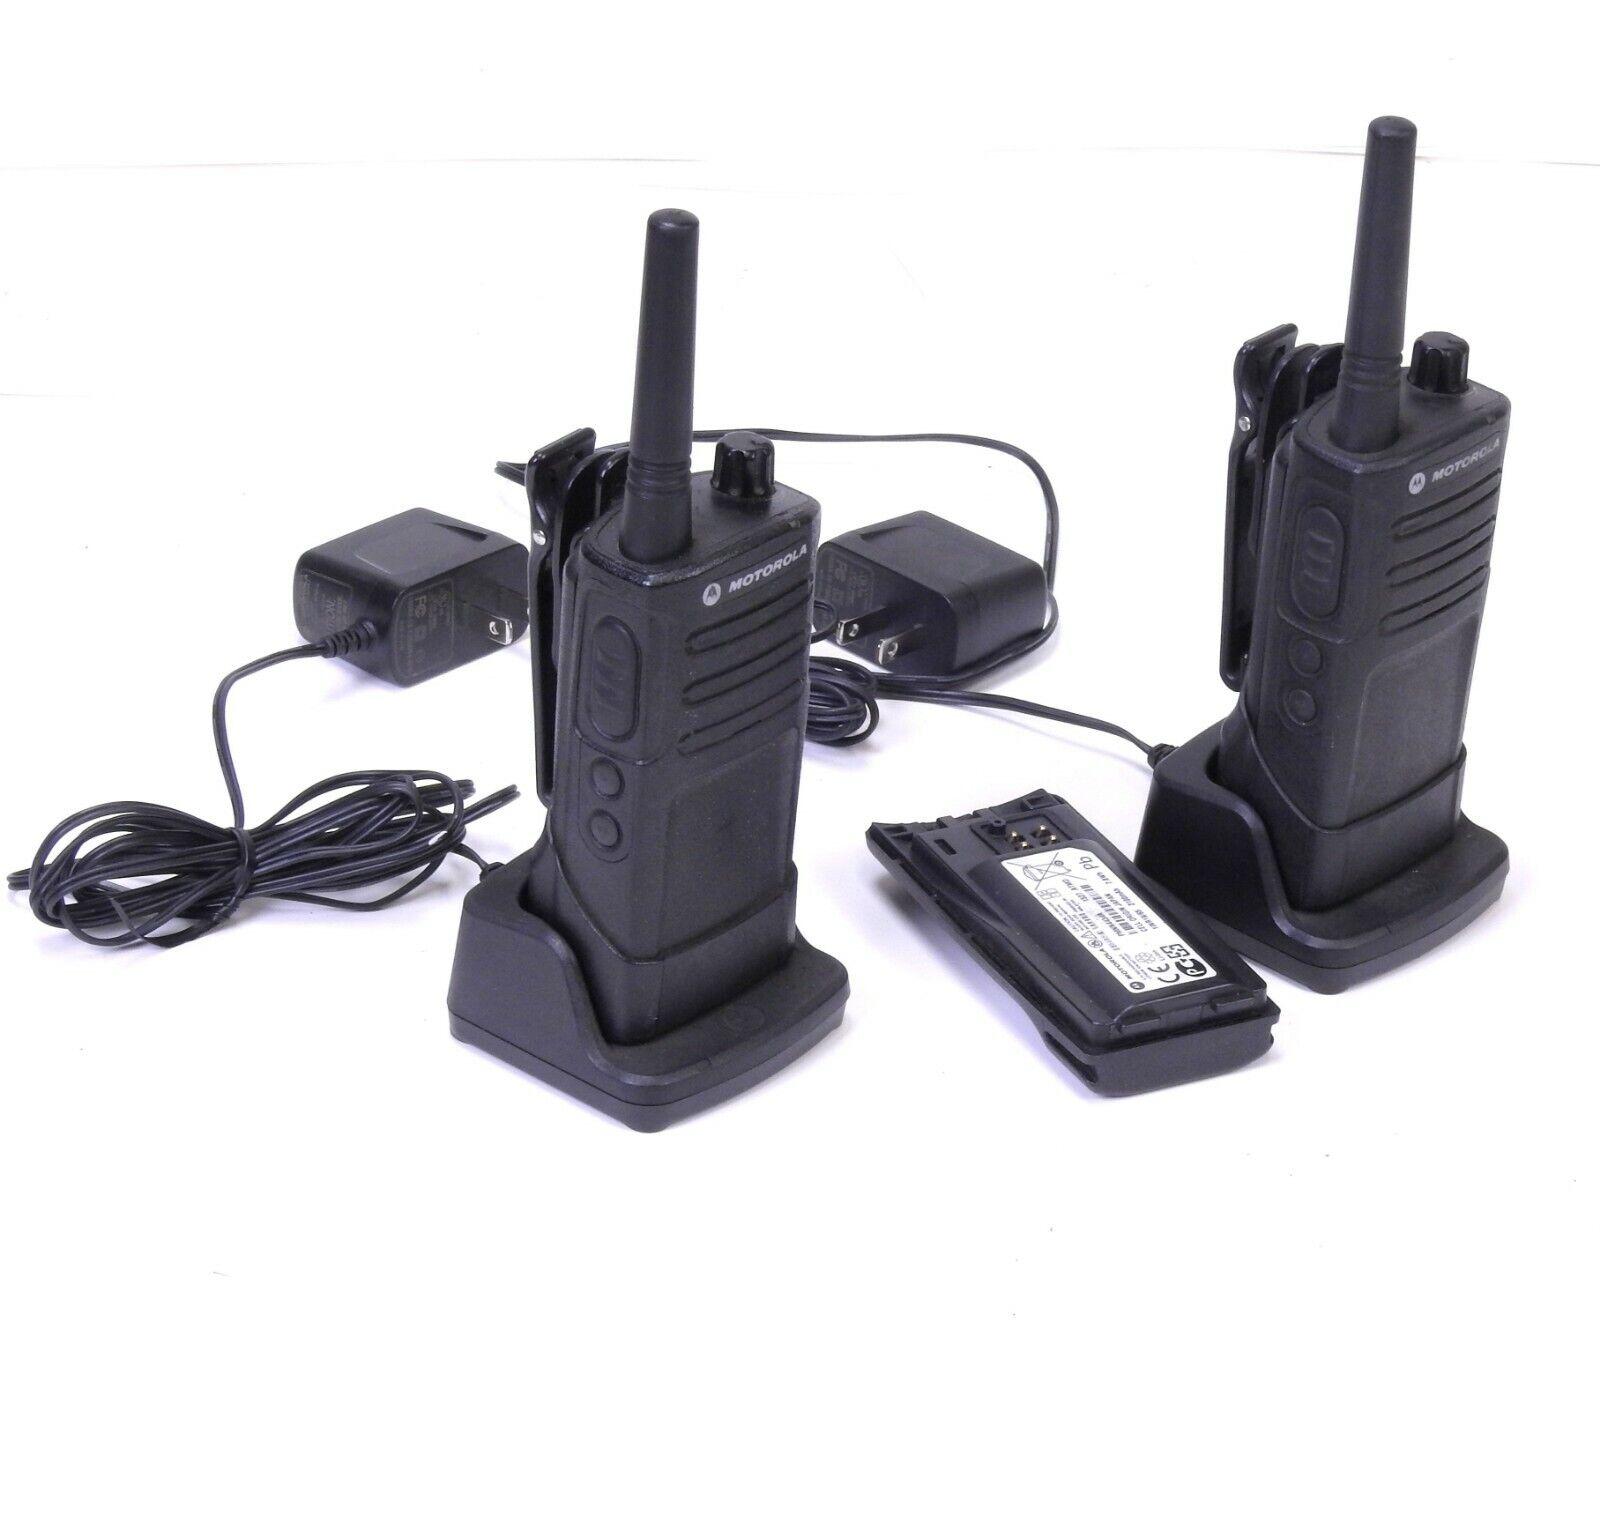 Set of 2 Motorola Two Way Business Radios